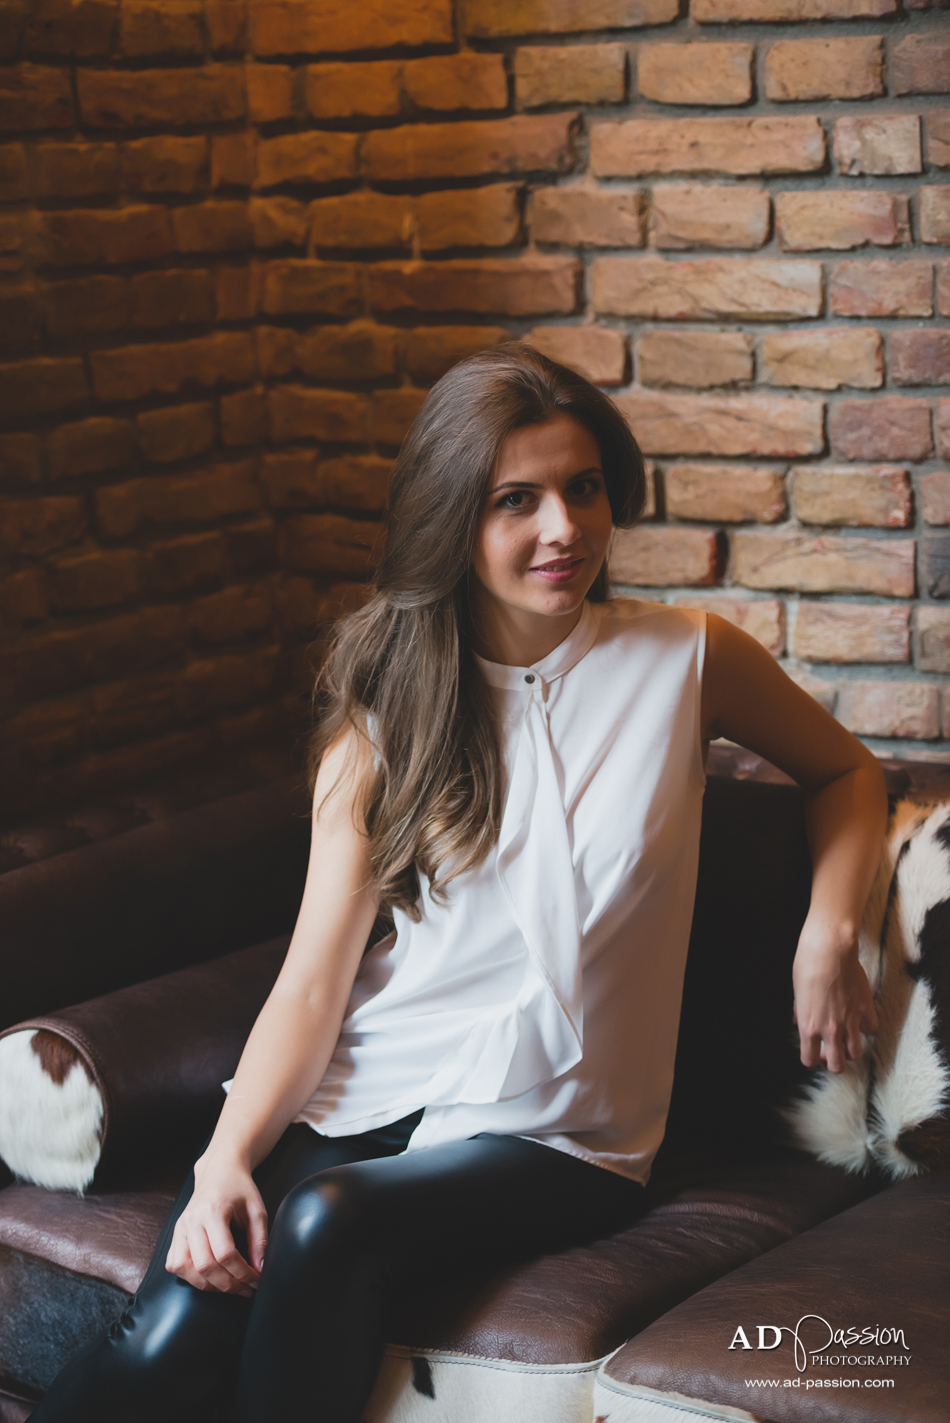 AD Passion Photography | rahela_fotografie-portret-timisoara_0014 | Adelin, Dida, fotograf profesionist, fotograf de nunta, fotografie de nunta, fotograf Timisoara, fotograf Craiova, fotograf Bucuresti, fotograf Arad, nunta Timisoara, nunta Arad, nunta Bucuresti, nunta Craiova